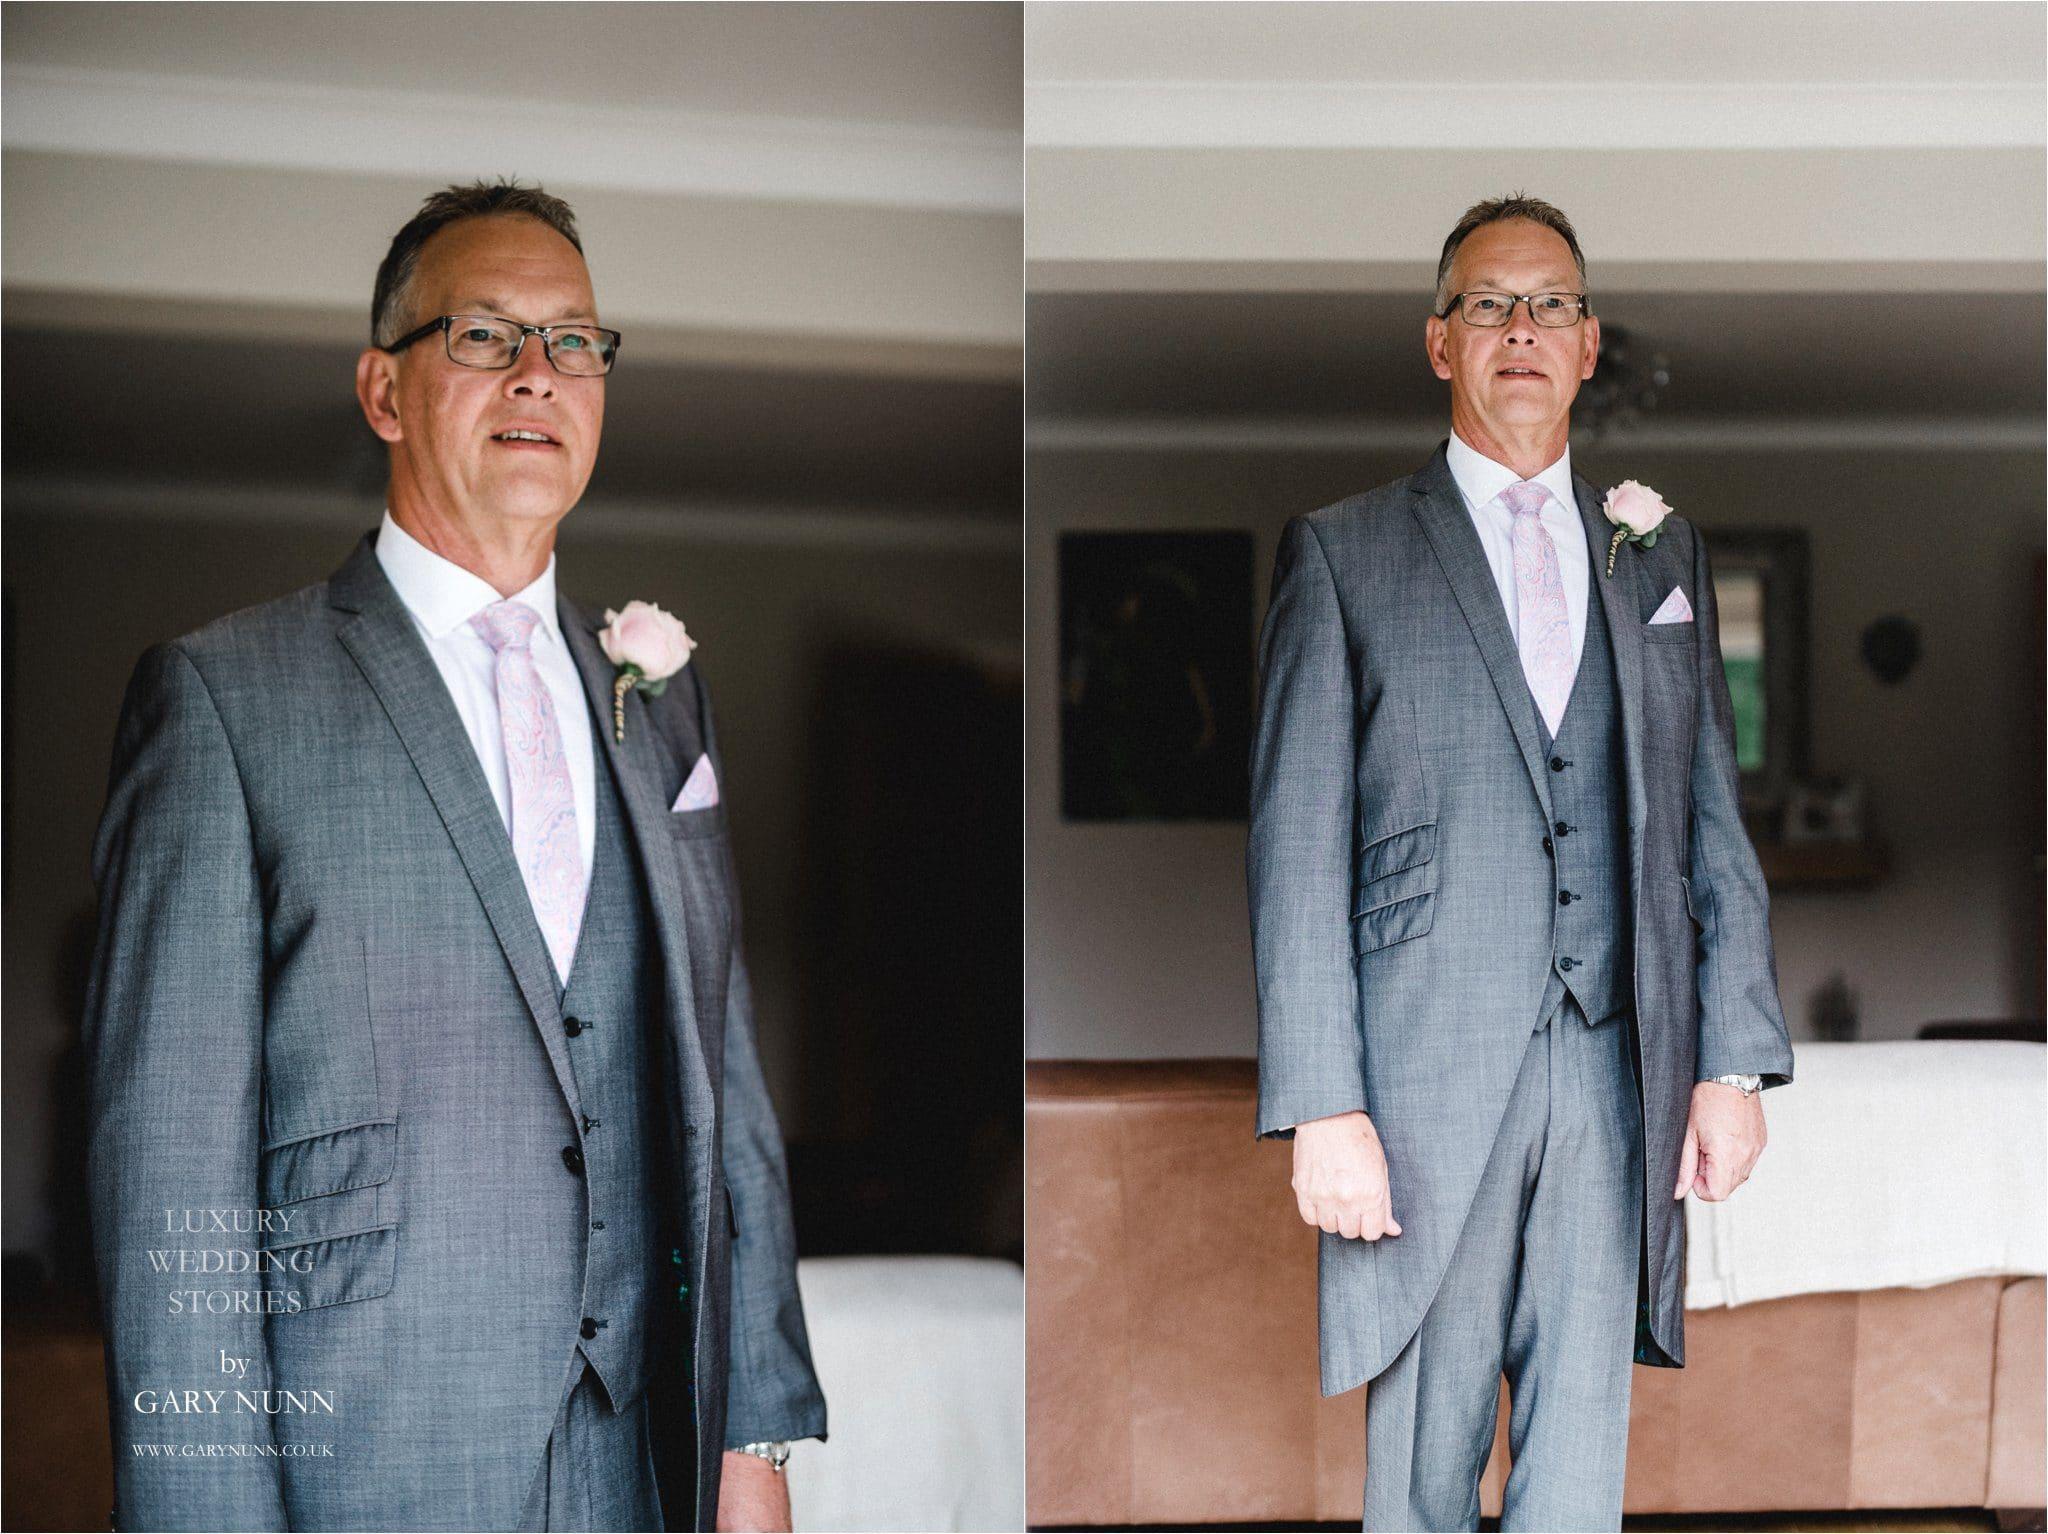 wedding photographer Milton Keynes, wedding photographer Leighton Buzzard, wedding photographer Bedfordshire, destination wedding photographer